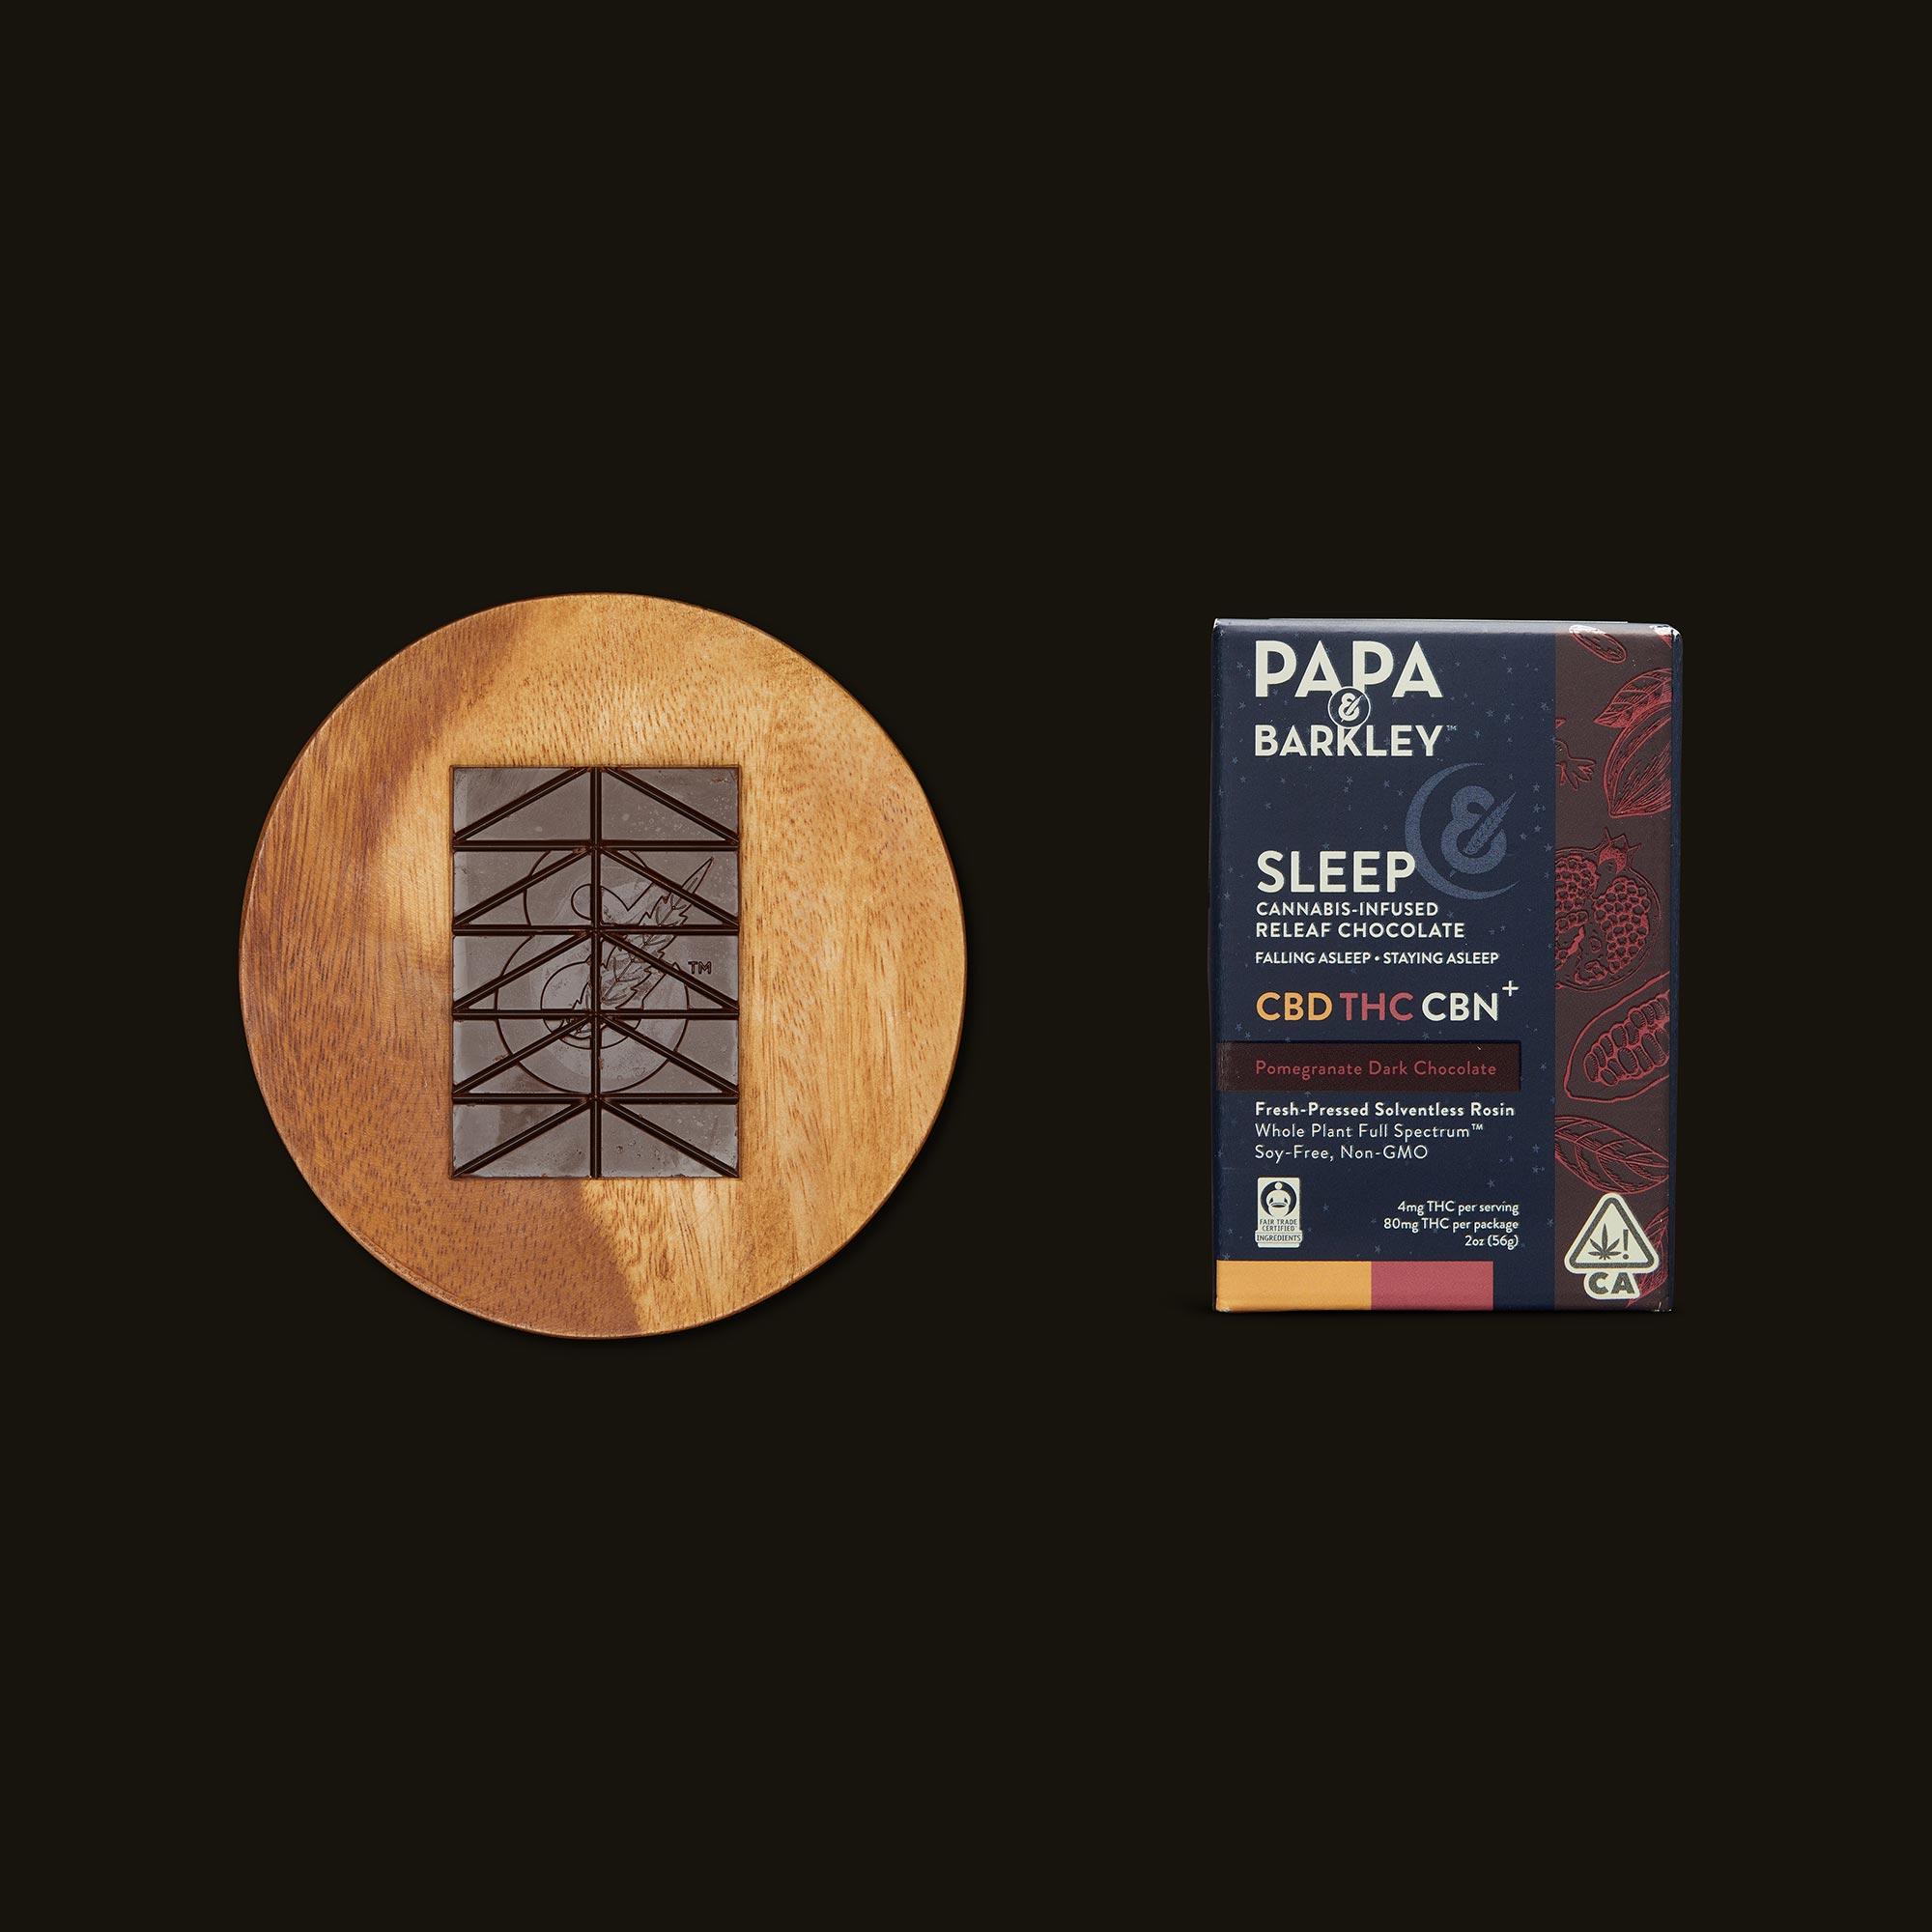 Papa & Barkley Sleep Pomegranate Dark Chocolate